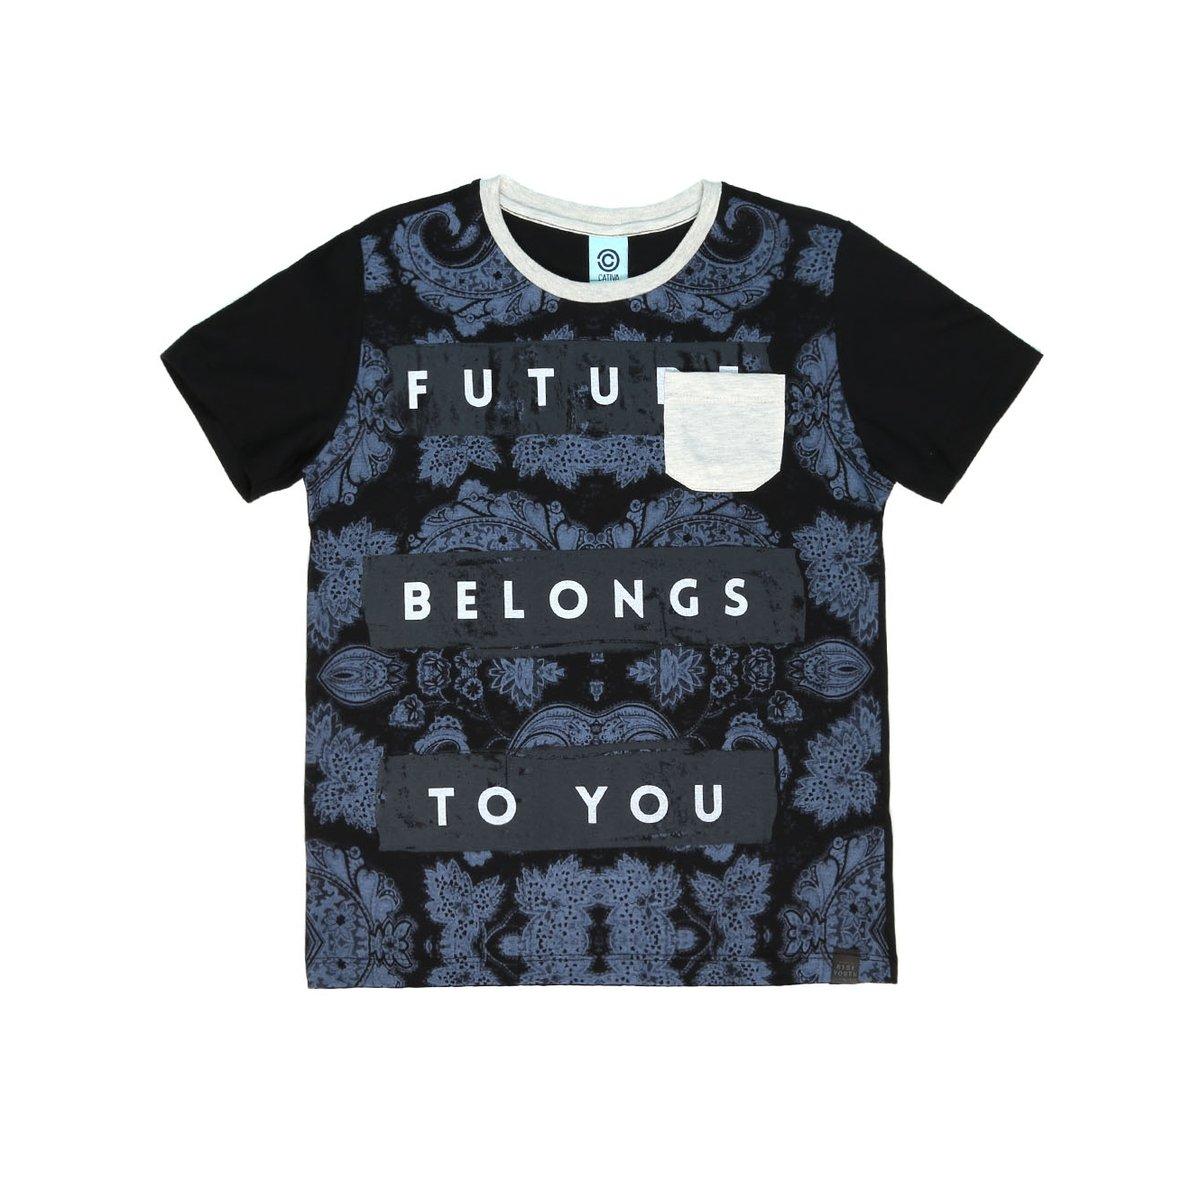 Camiseta Manga Curta Juvenil Para Menino Cativa Preto - Compre Agora ... 886b202021c27